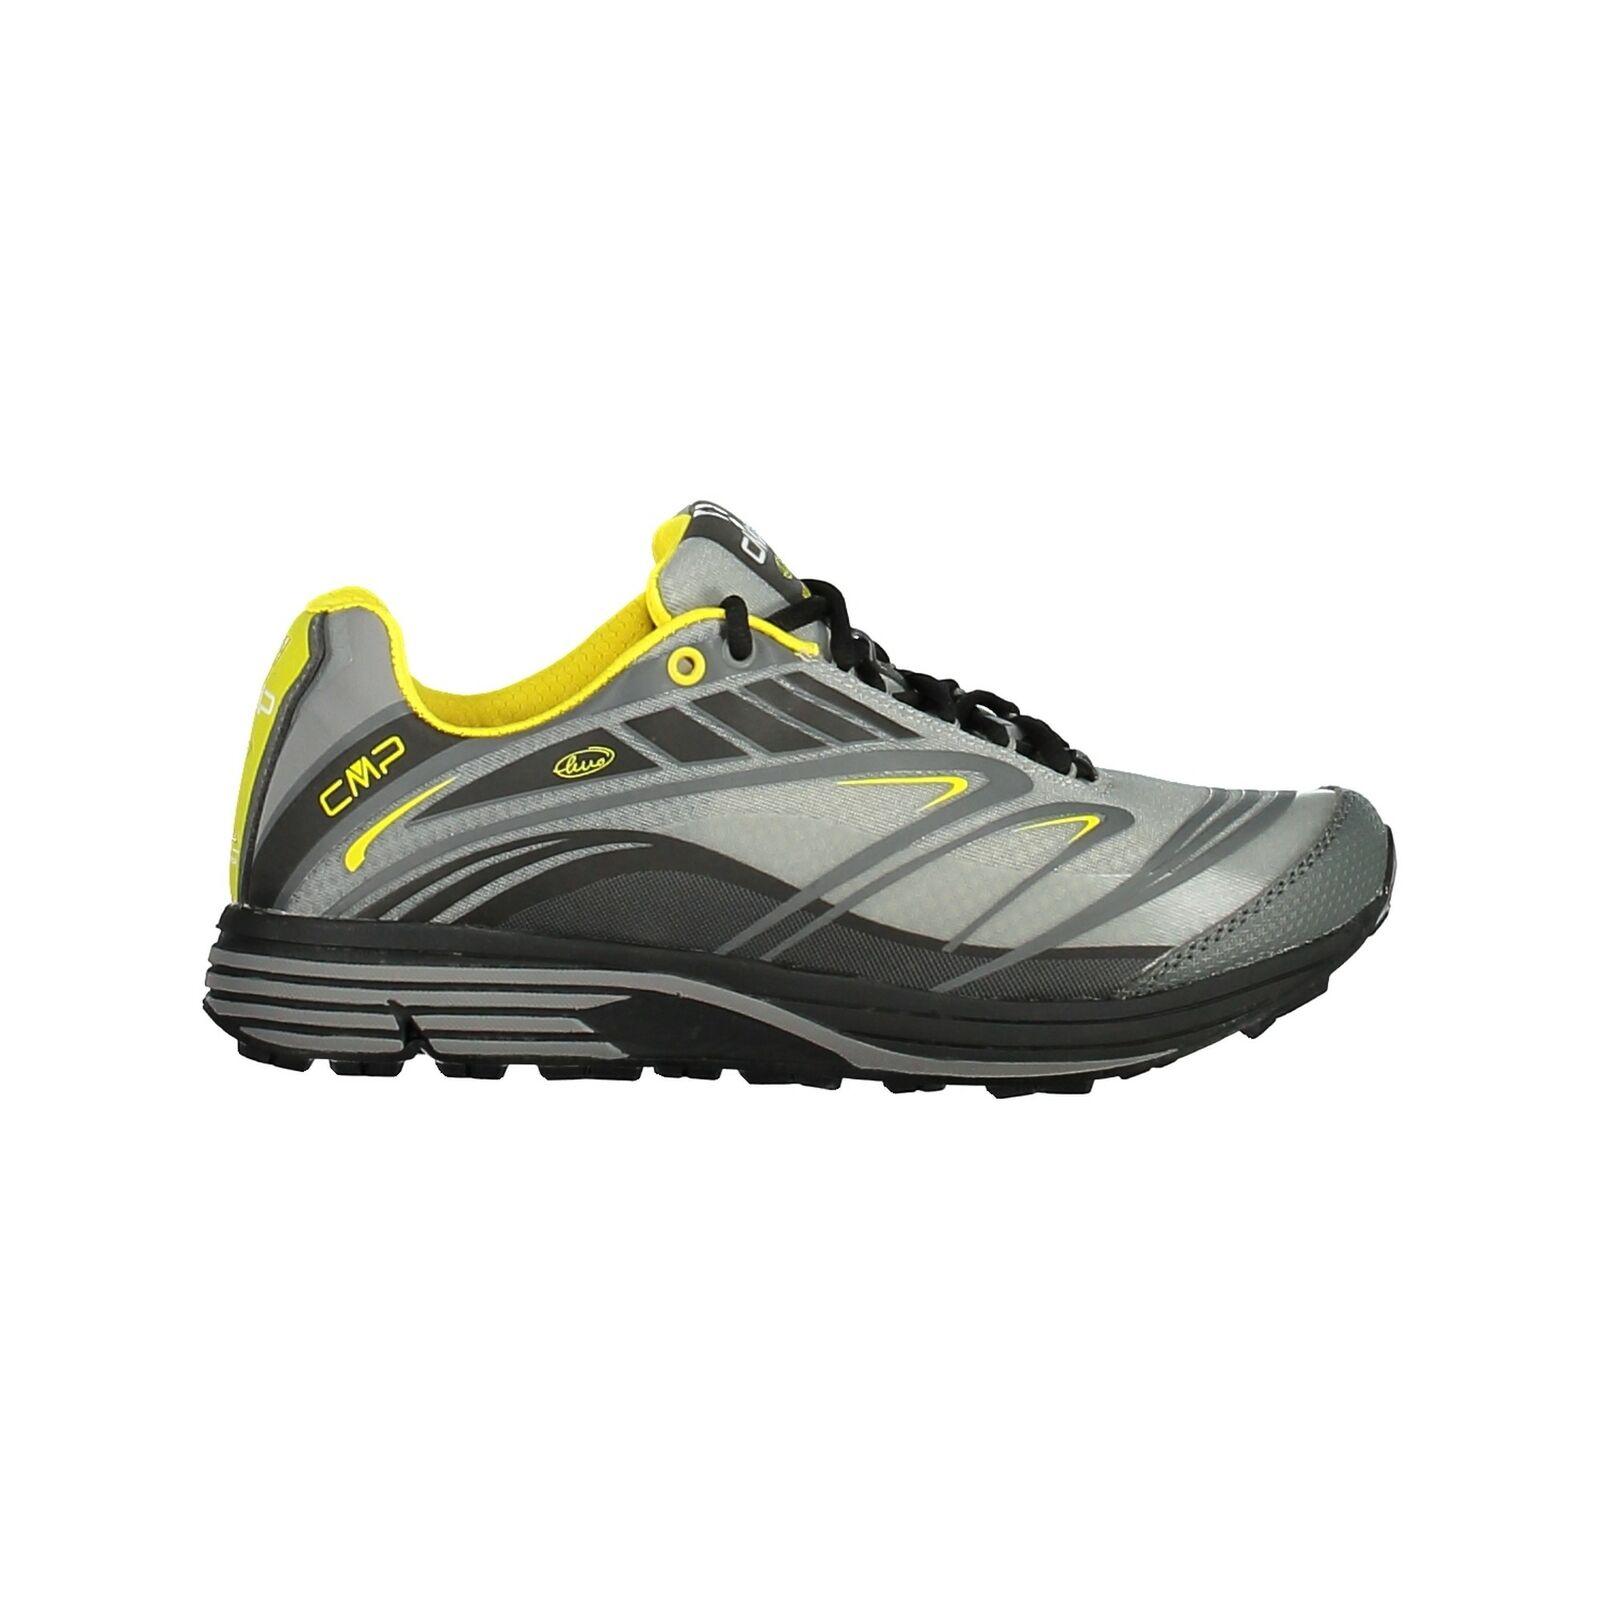 CMP Running Sports shoes Maia Trail shoes Grey Light Plain Colour Nylon Mesh